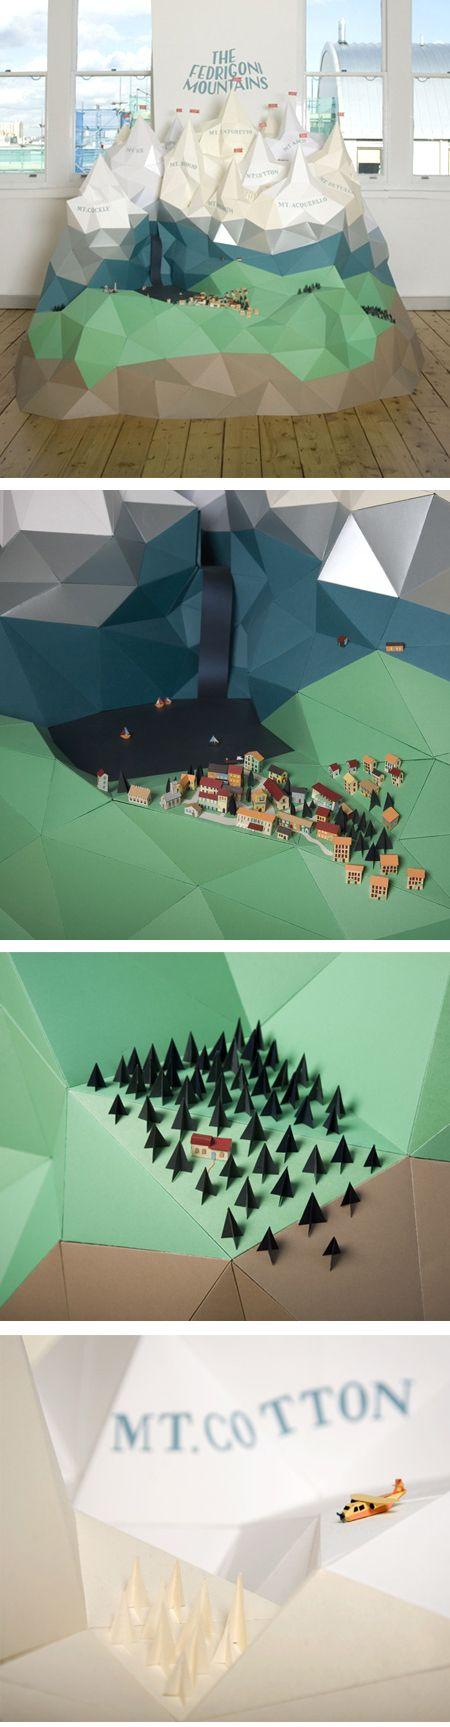 Paper Mountain Installation